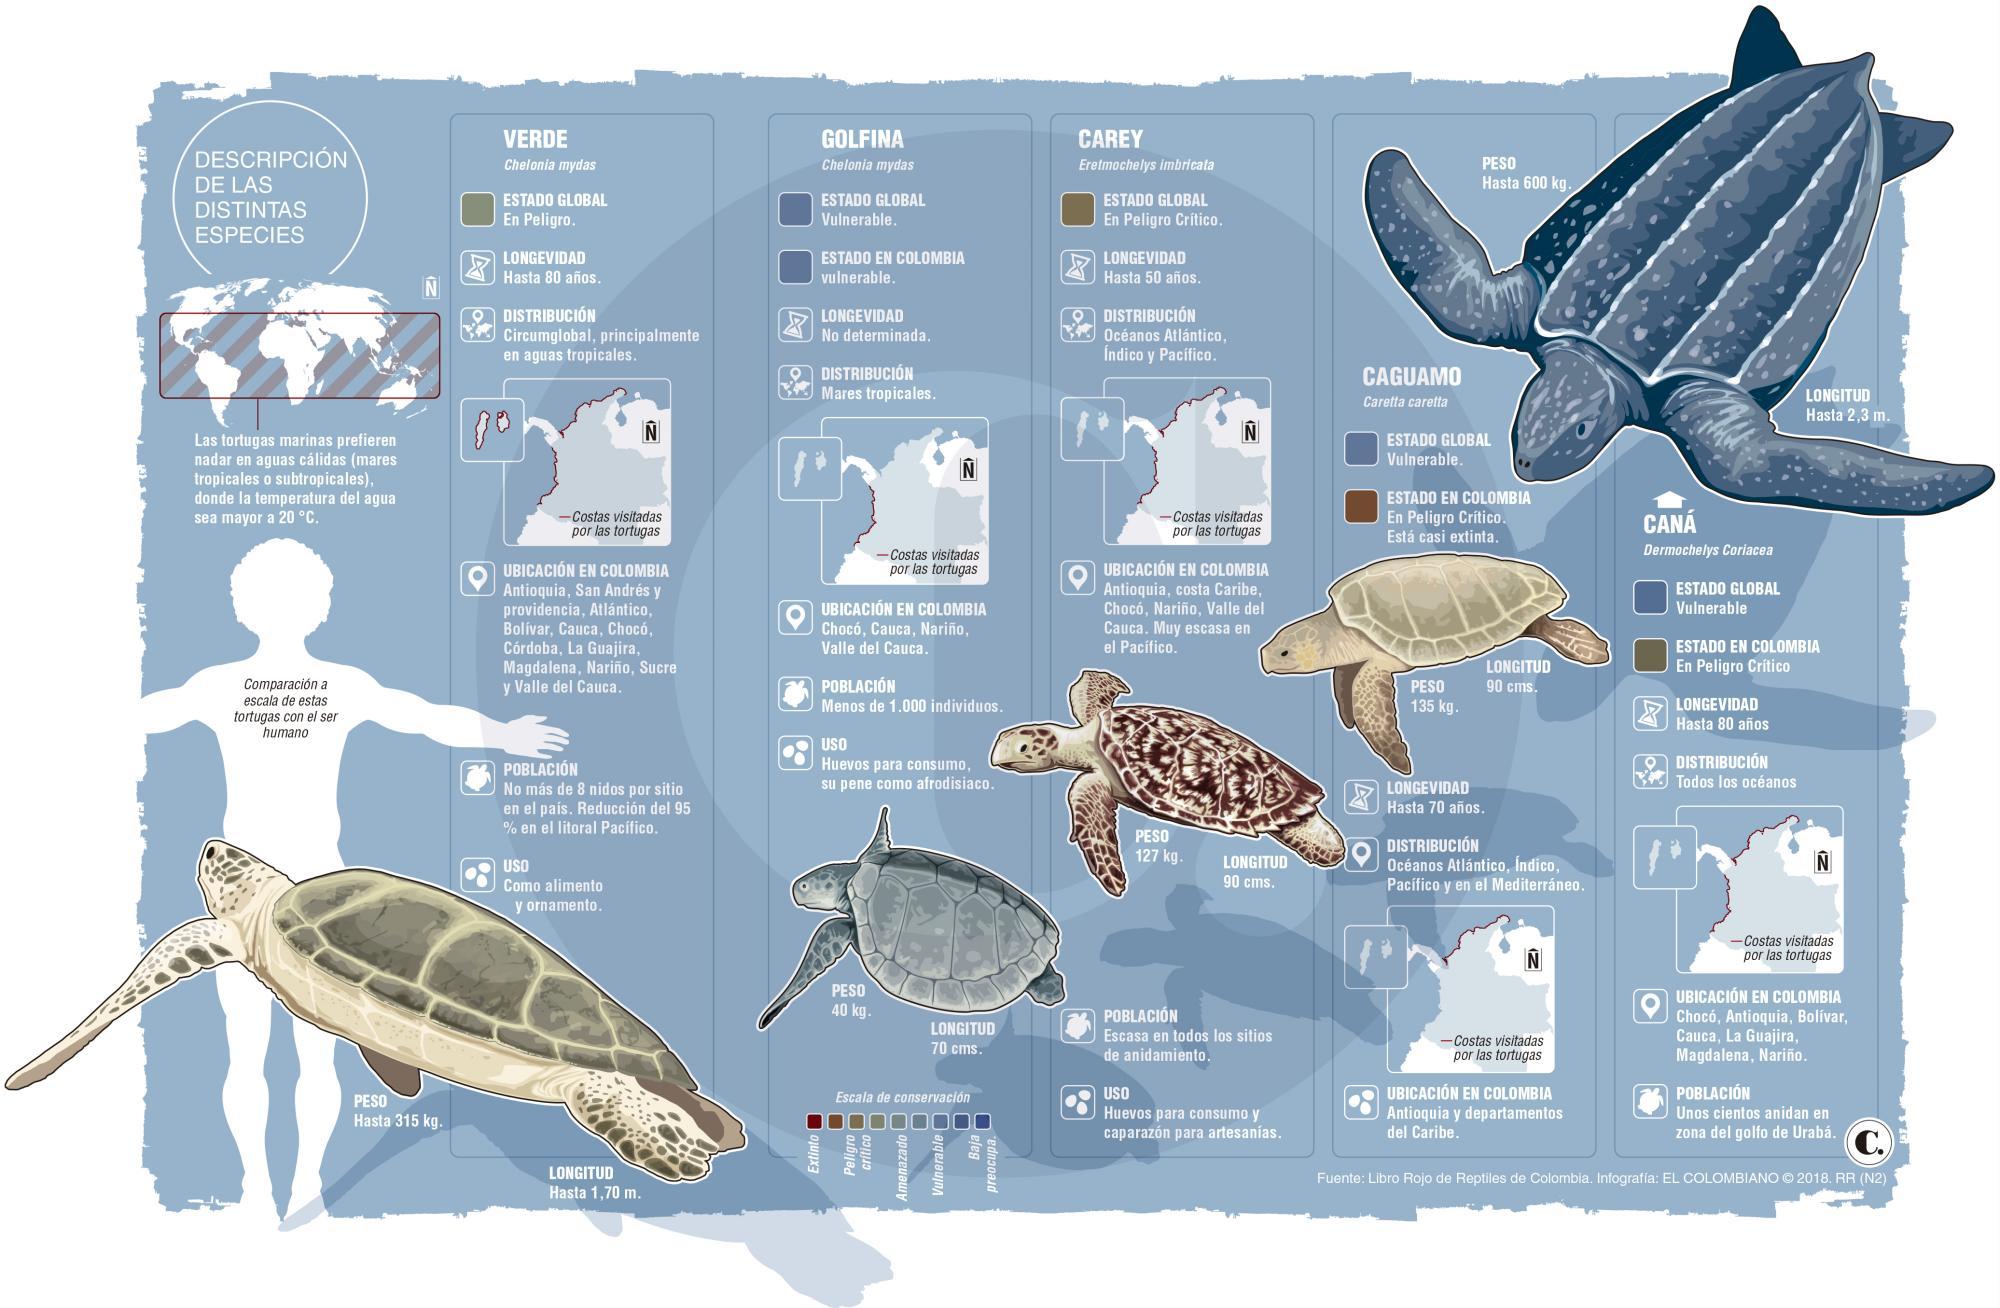 Tortugas marinas: grandes olvidadas